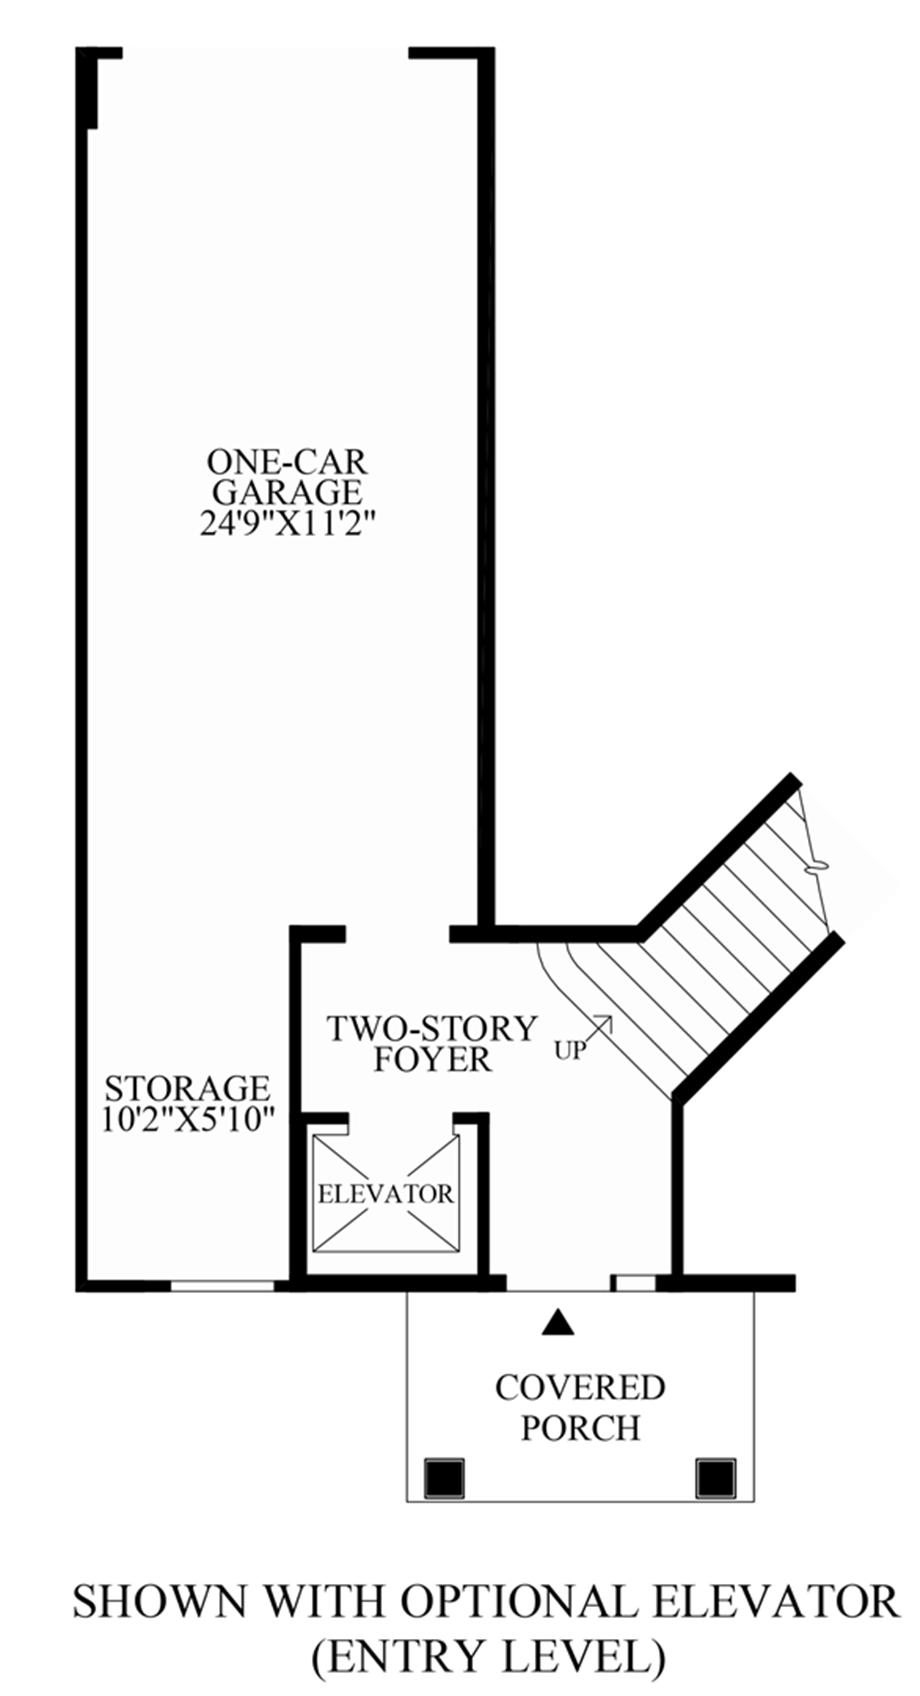 Optional Elevator (Entry Level) Floor Plan